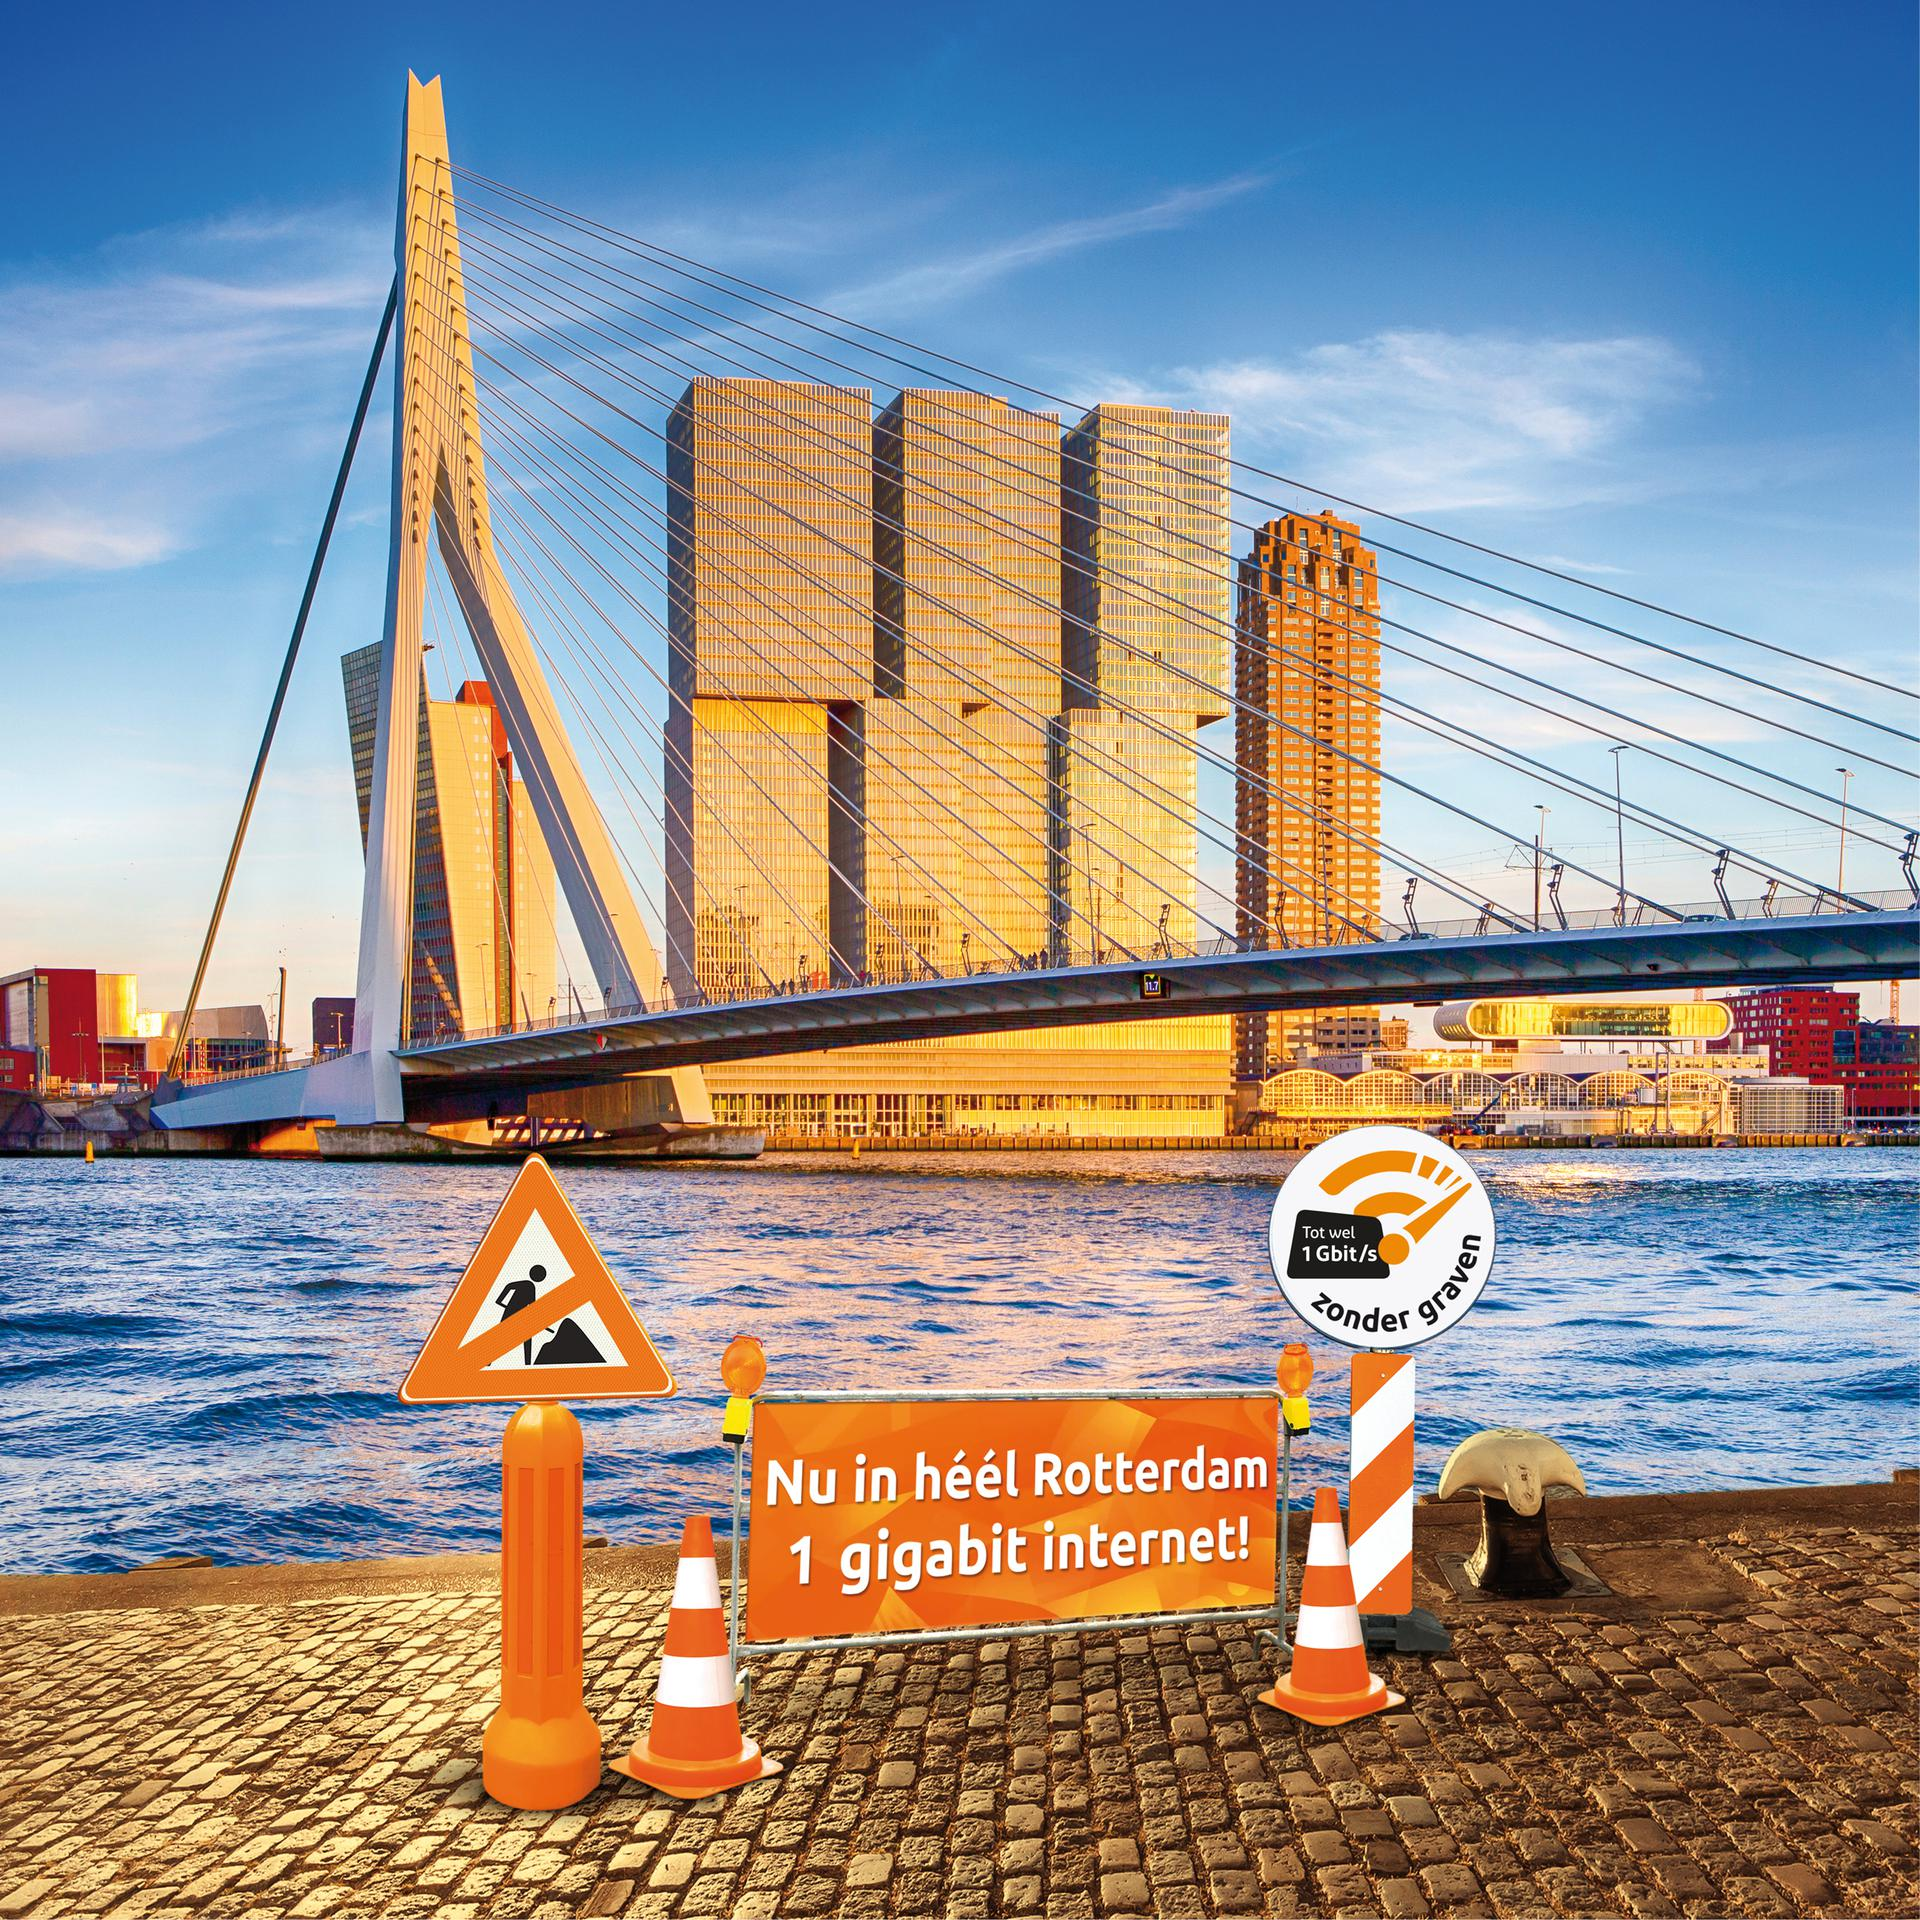 2551_ZIG_Giganet_Rotterdam_DK_groot